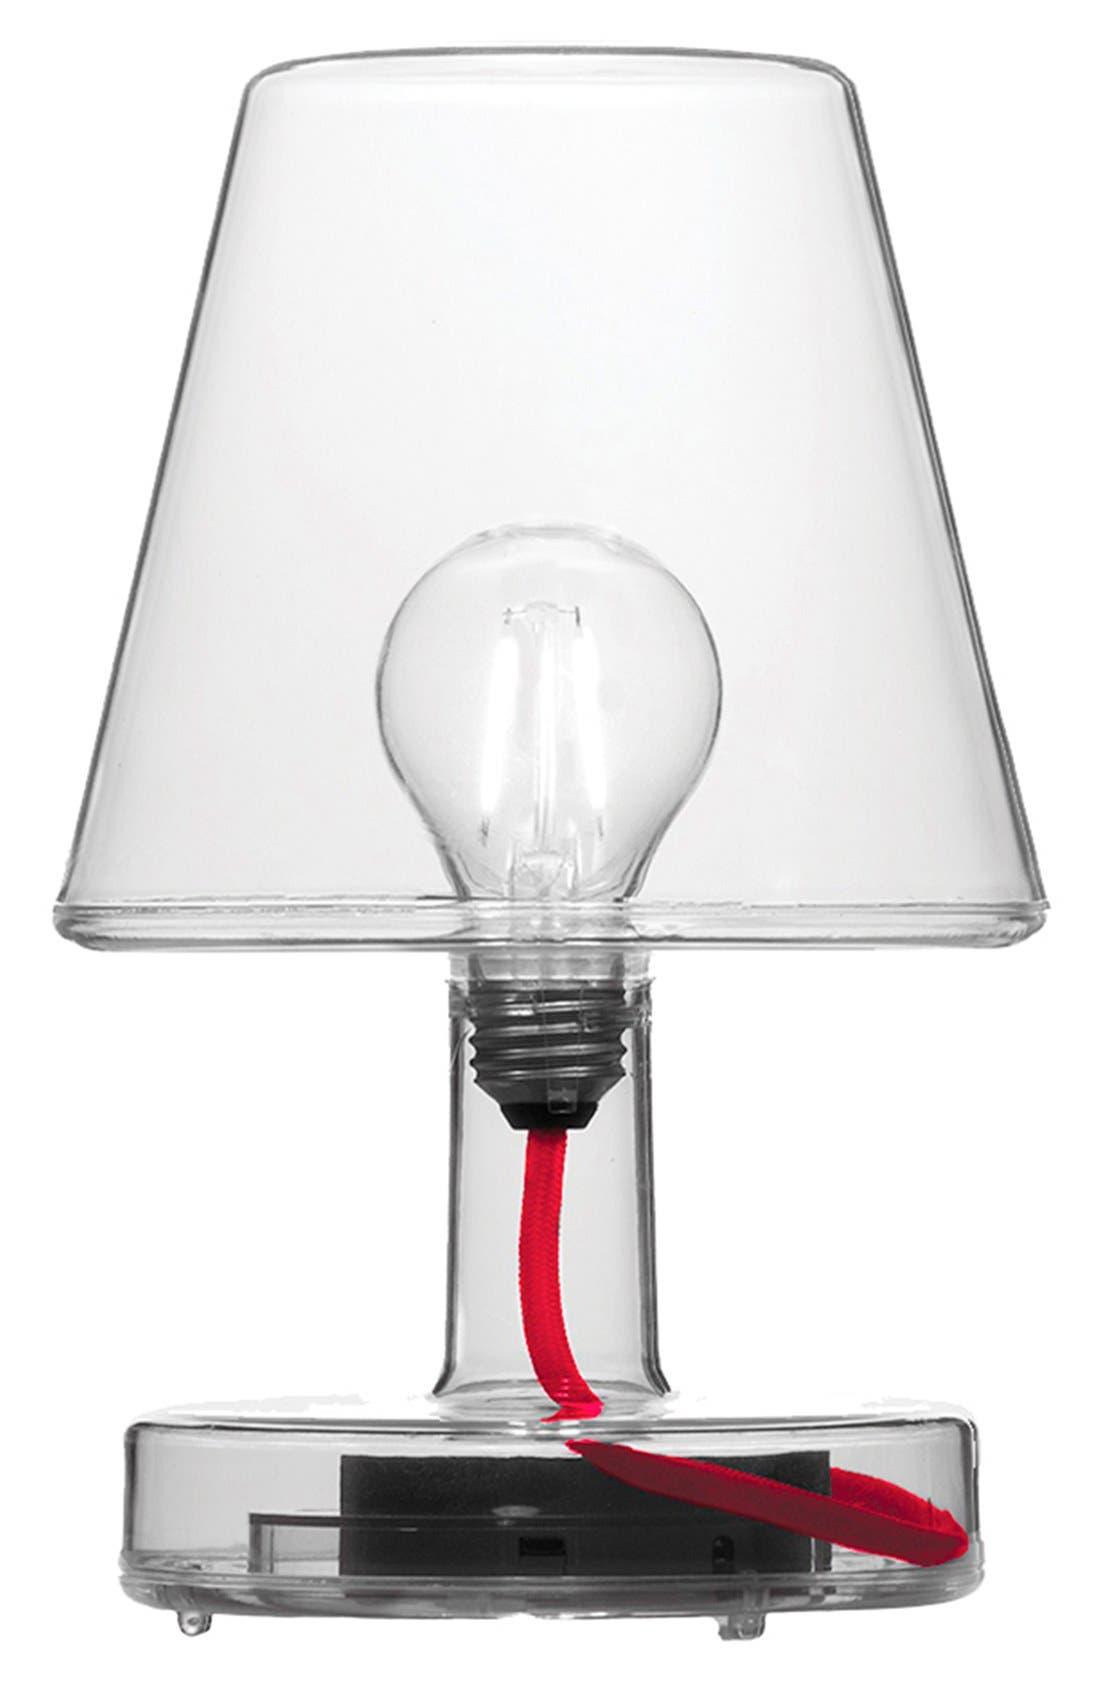 Transloetje Lamp,                             Main thumbnail 1, color,                             020